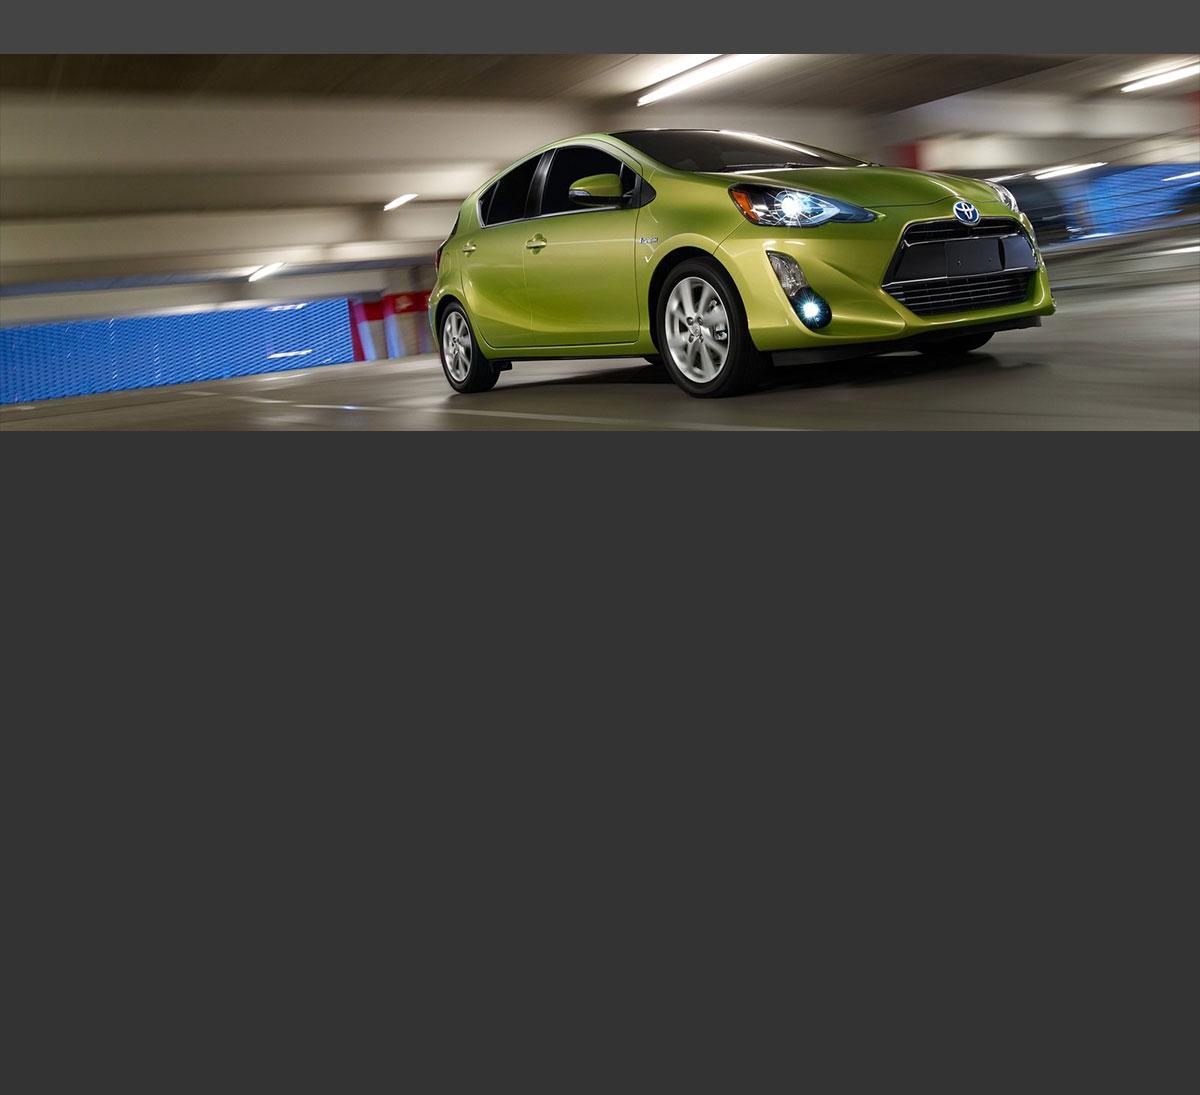 Chrysler Used Cars financing For Sale Milwaukie Brooks Motor Company Inc